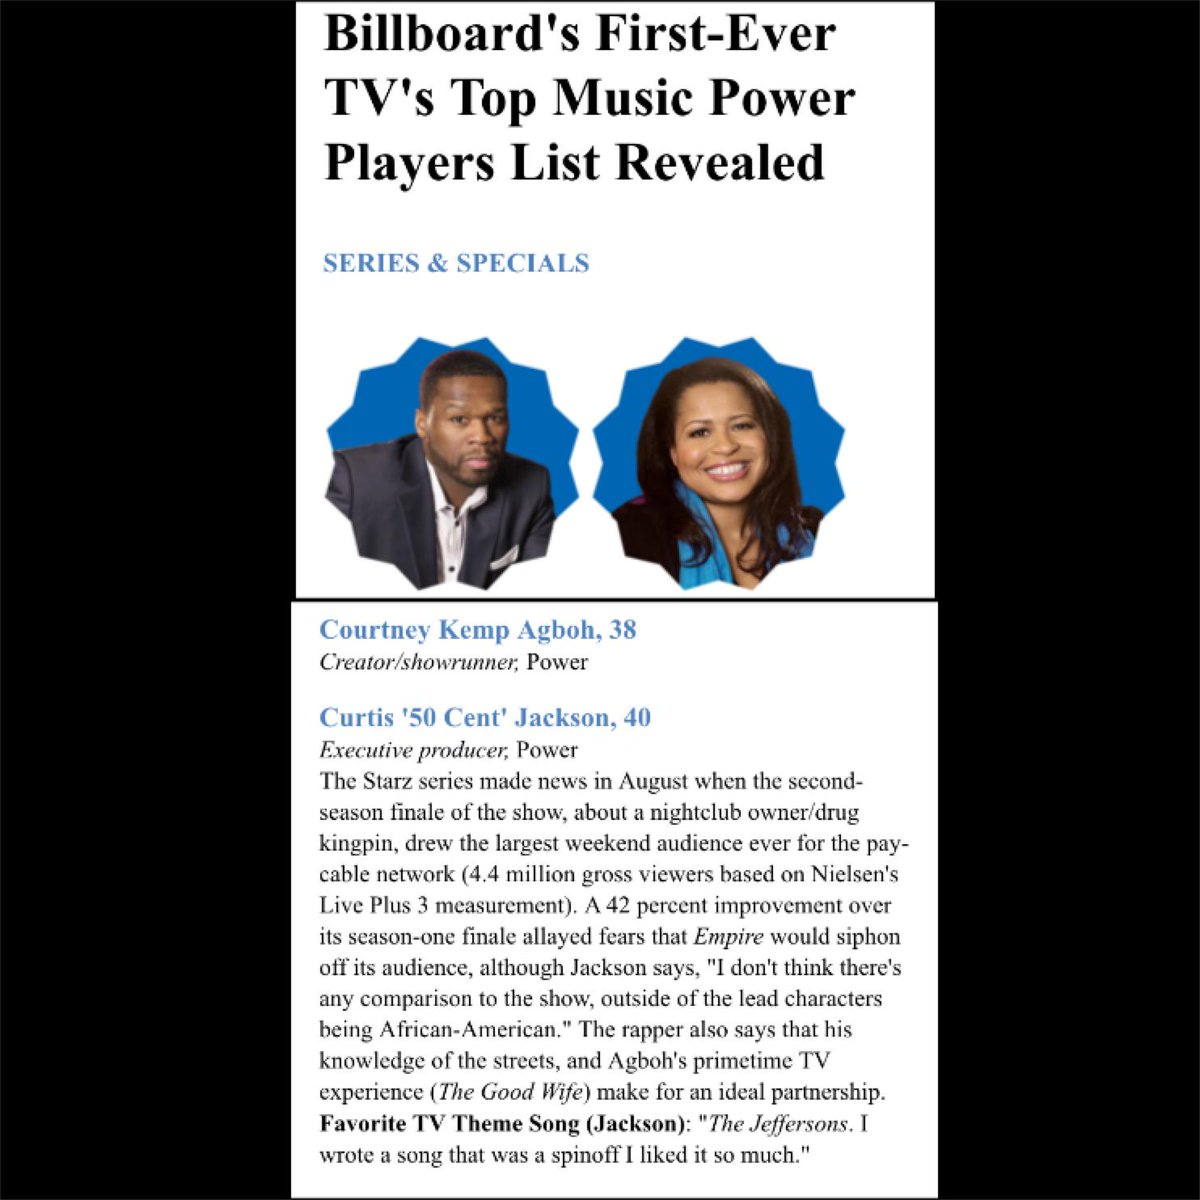 BILLBOARD's FIRST-EVER TV's TOP MUSIC POWER PLAYER LIST REVEALED  http://t.co/eyUrpQ3zKQ #EFFENVODKA http://t.co/Y4ONbUZ9UV